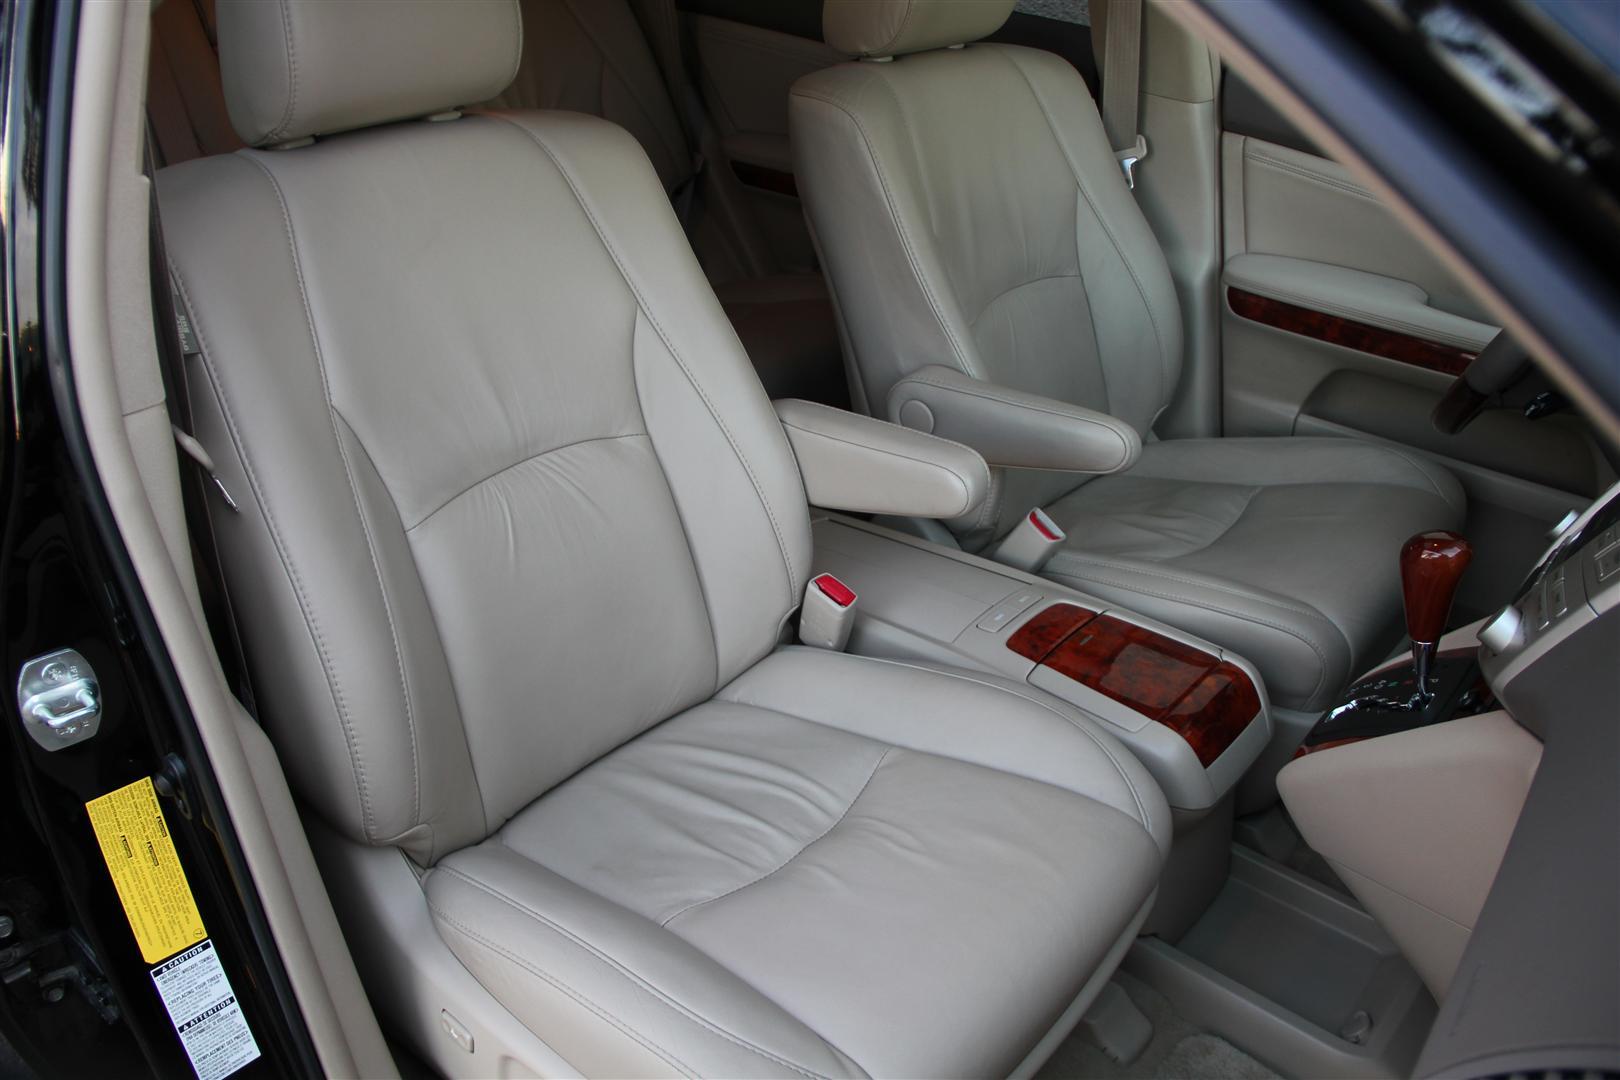 2009 lexus rx350 awd pebble beach ultra premium ed envision auto 2009 Lexus RX 350 Interior 2009 lexus rx 350 owner manual